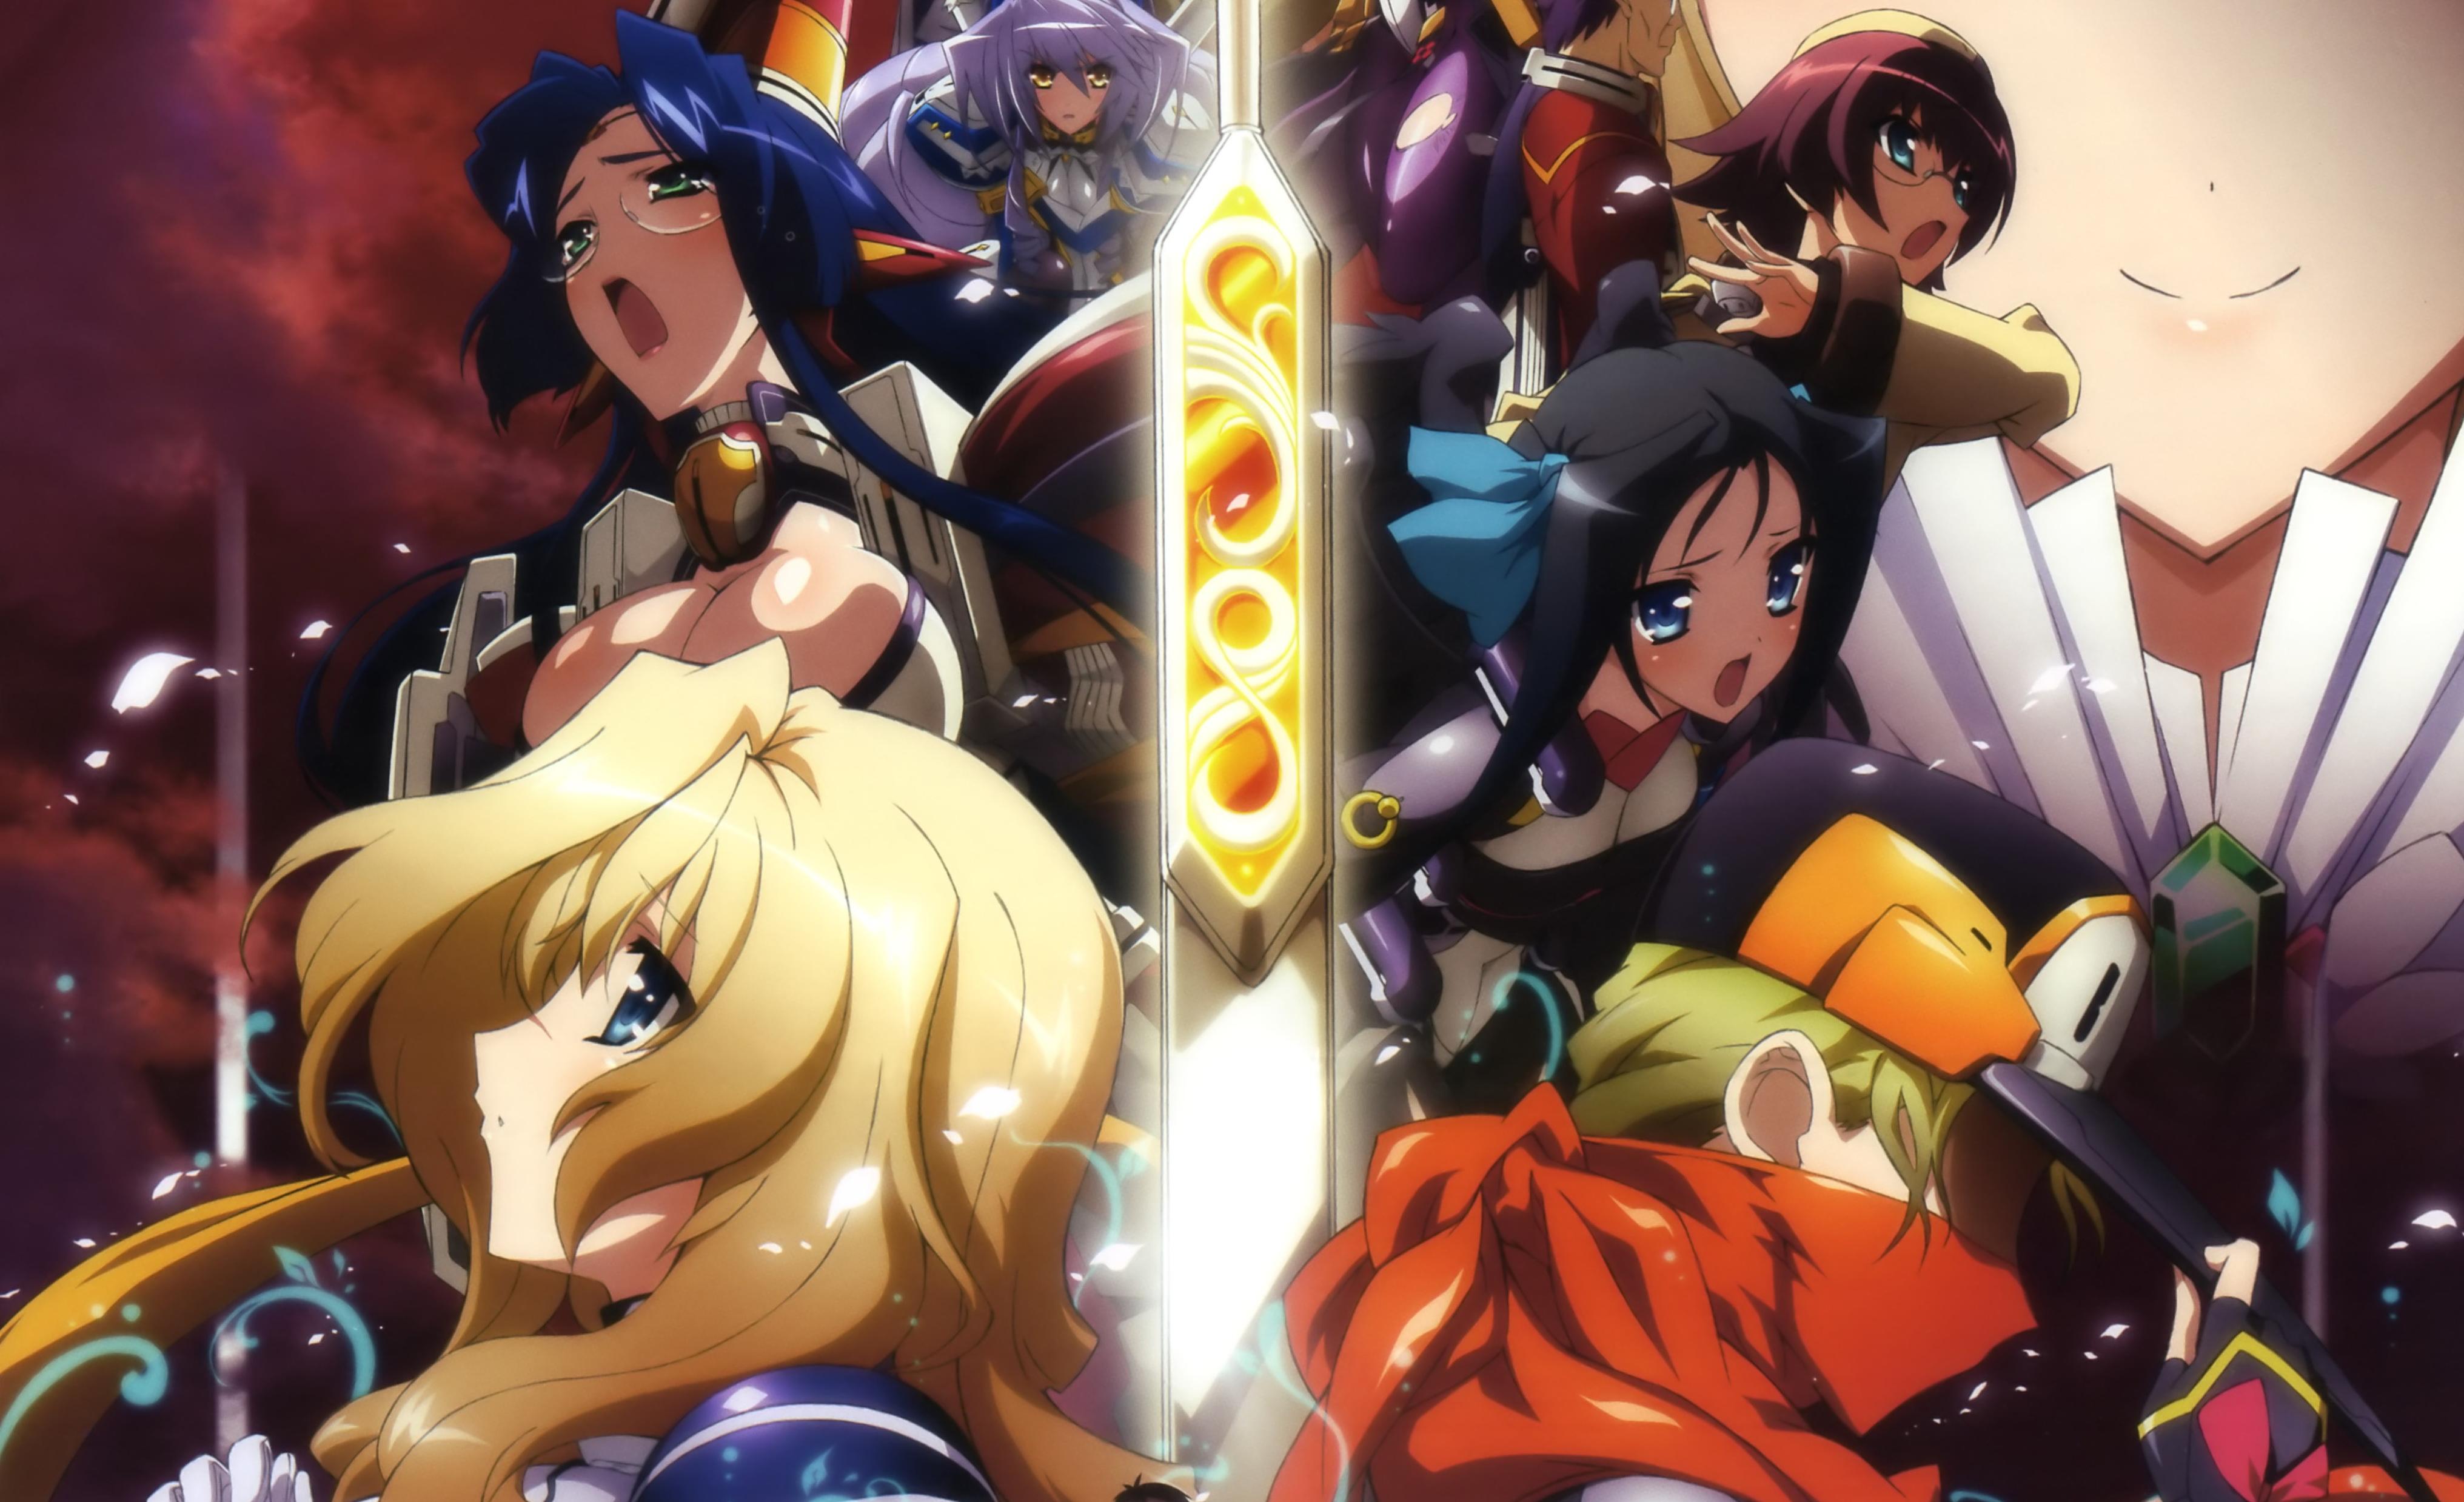 Images Kyoukai Senjou No Horizon Girls Anime 4064x2477